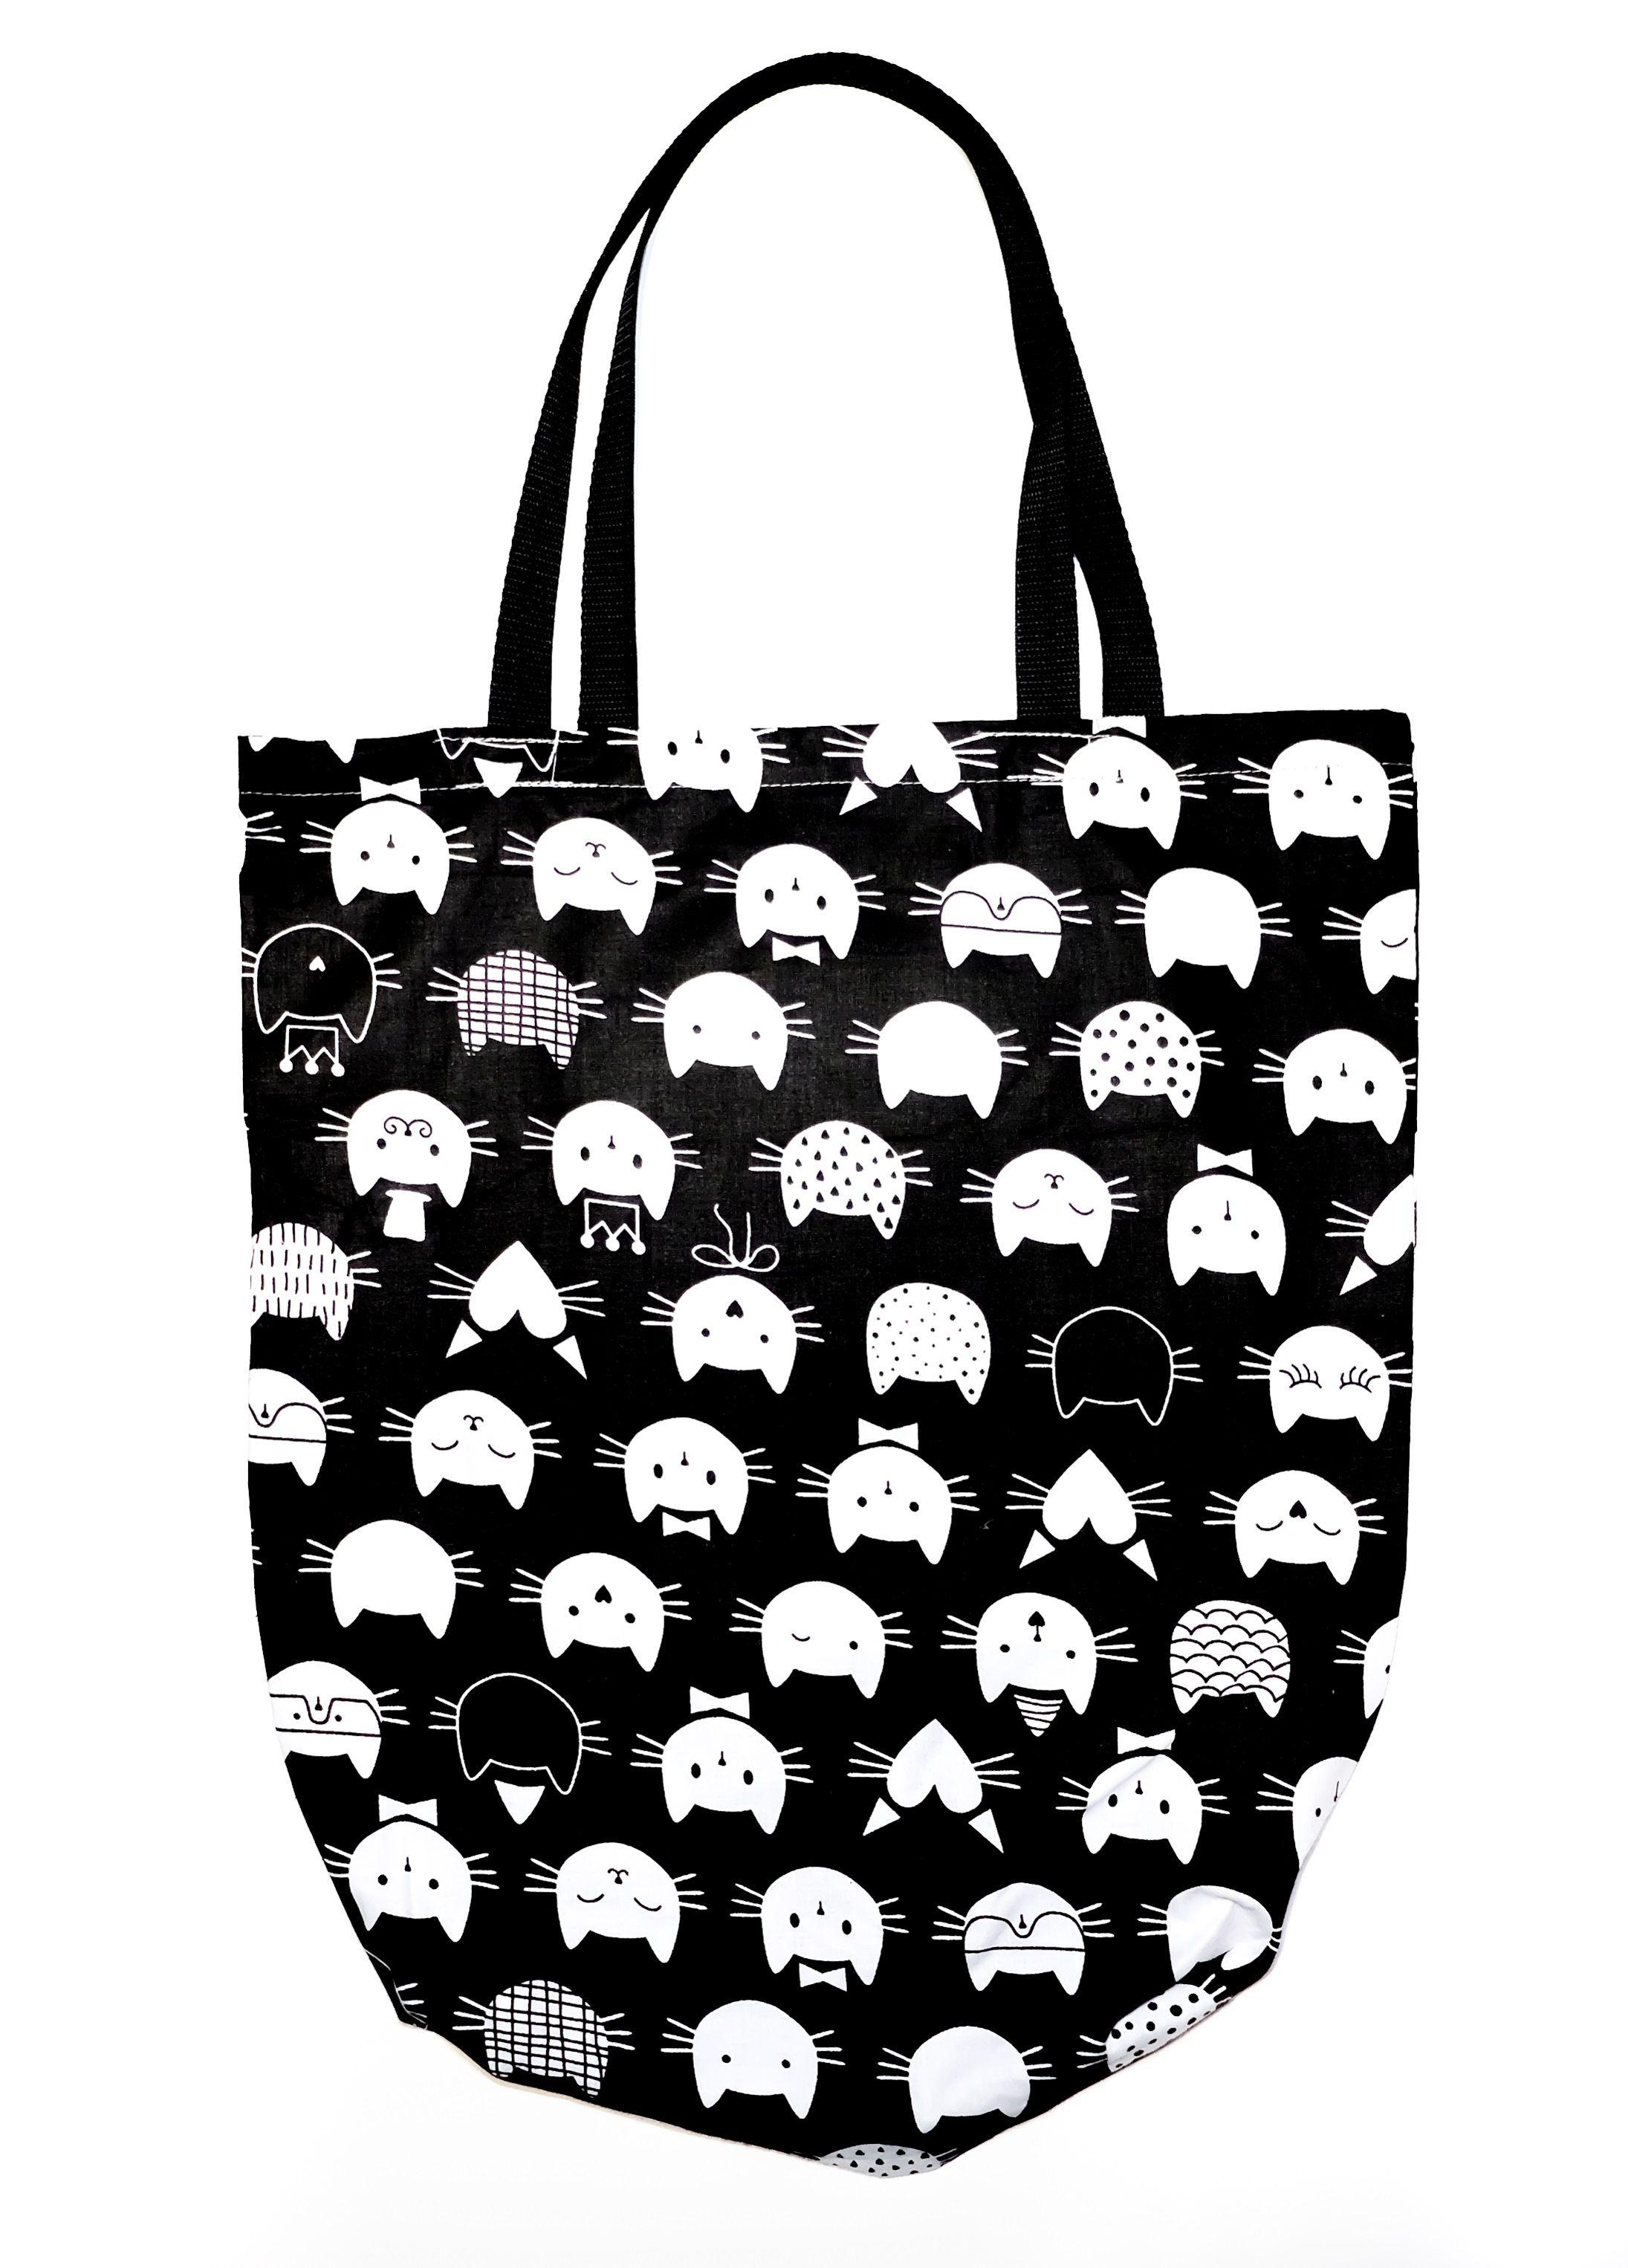 Pin On Cotton Eko Bag Bawelniane Torby Na Zakupy Wlasna Marka